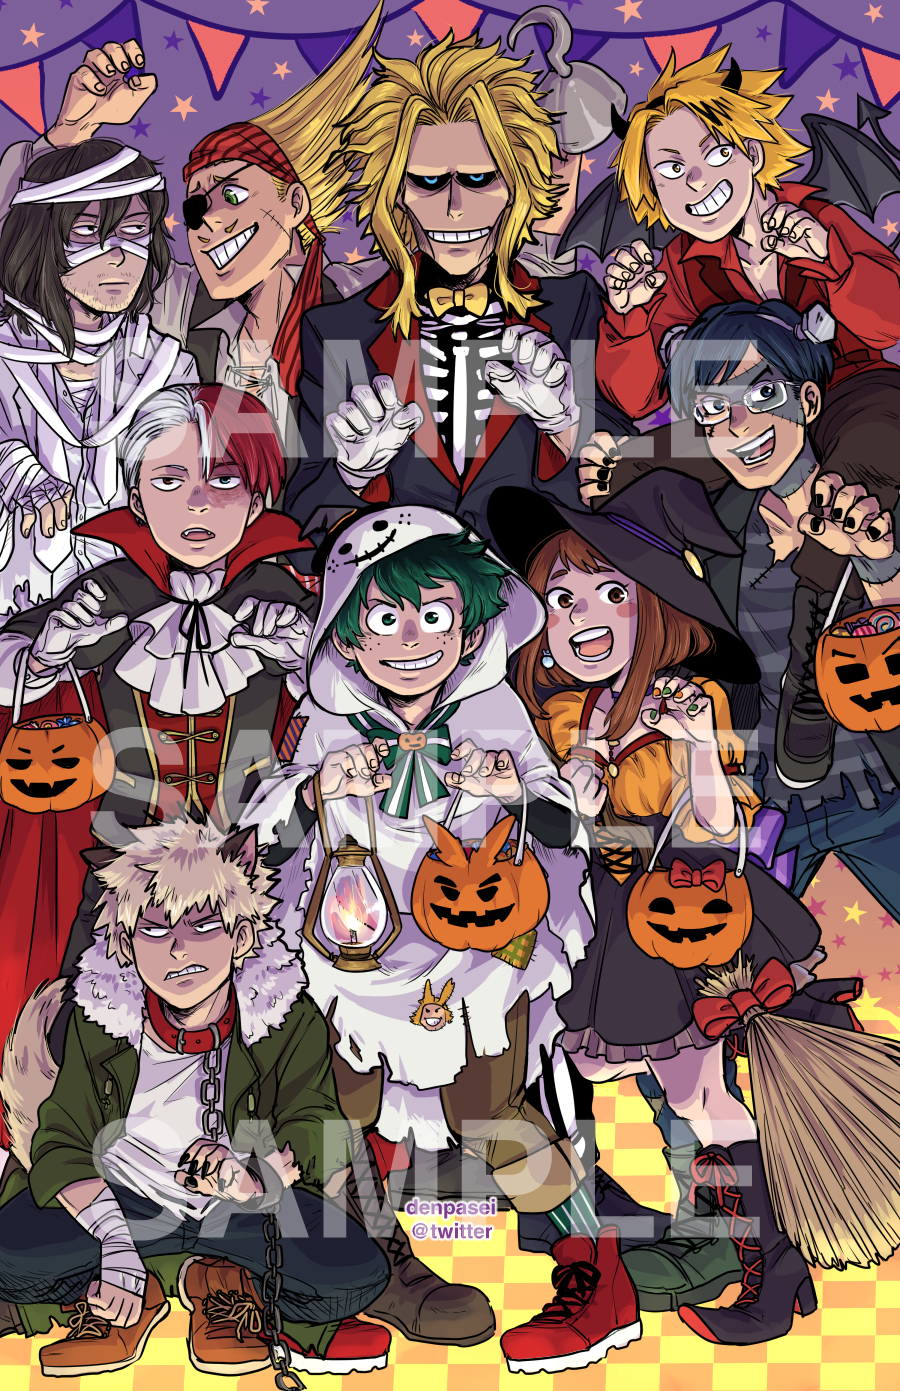 Image Result For Bnha Halloween Anime Halloween Anime My Hero